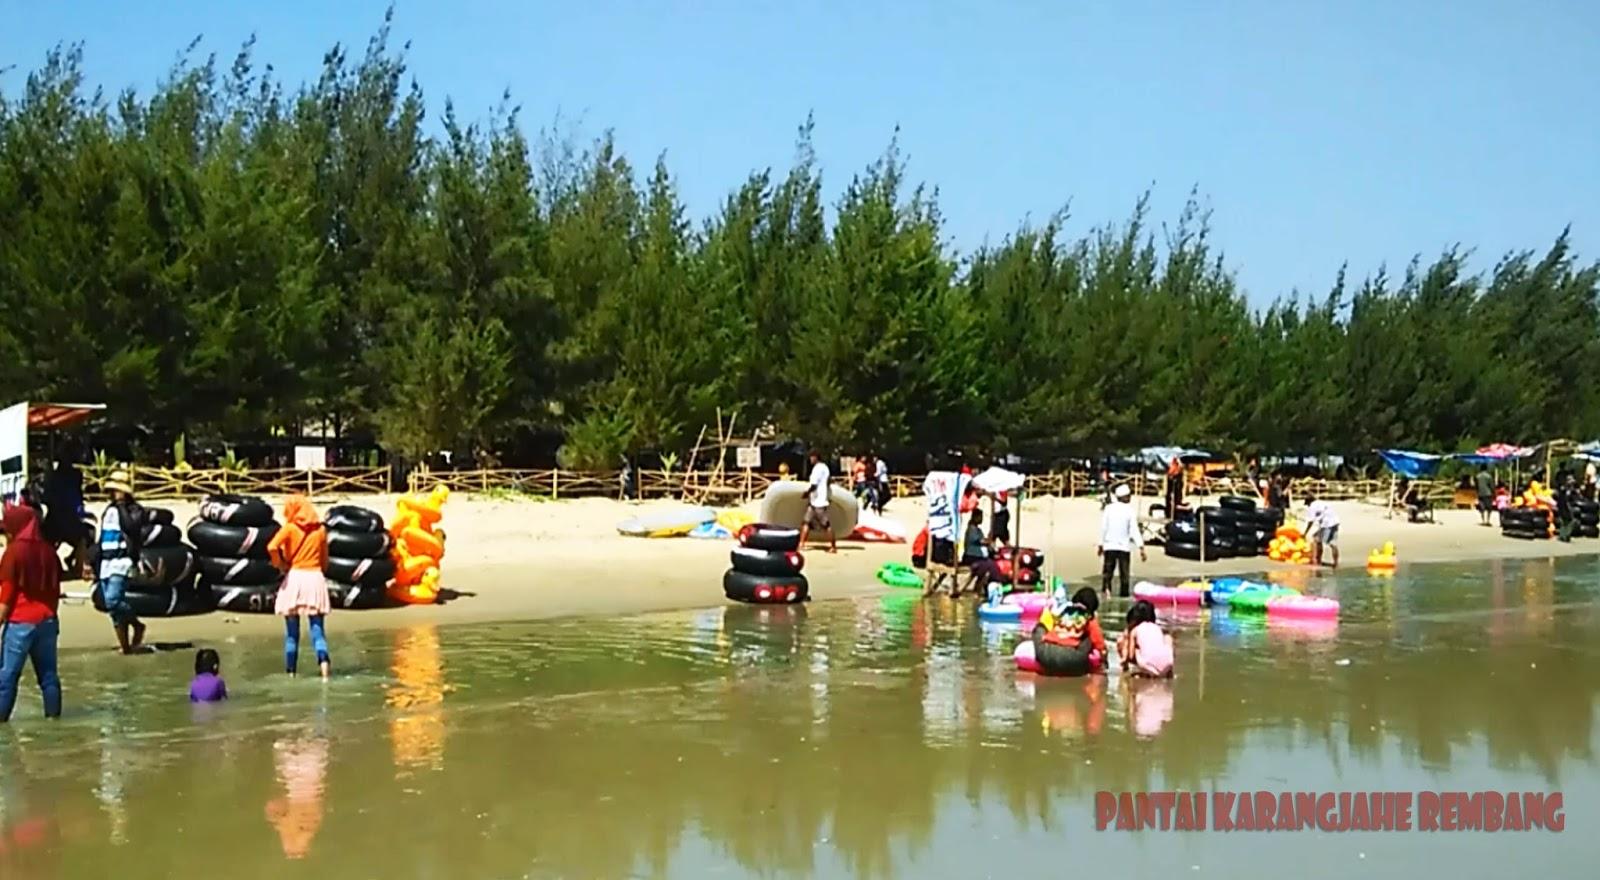 Pantai Karangjahe Menjadi Idola Masyarakat Rembang Metro Pati Karang Jahe